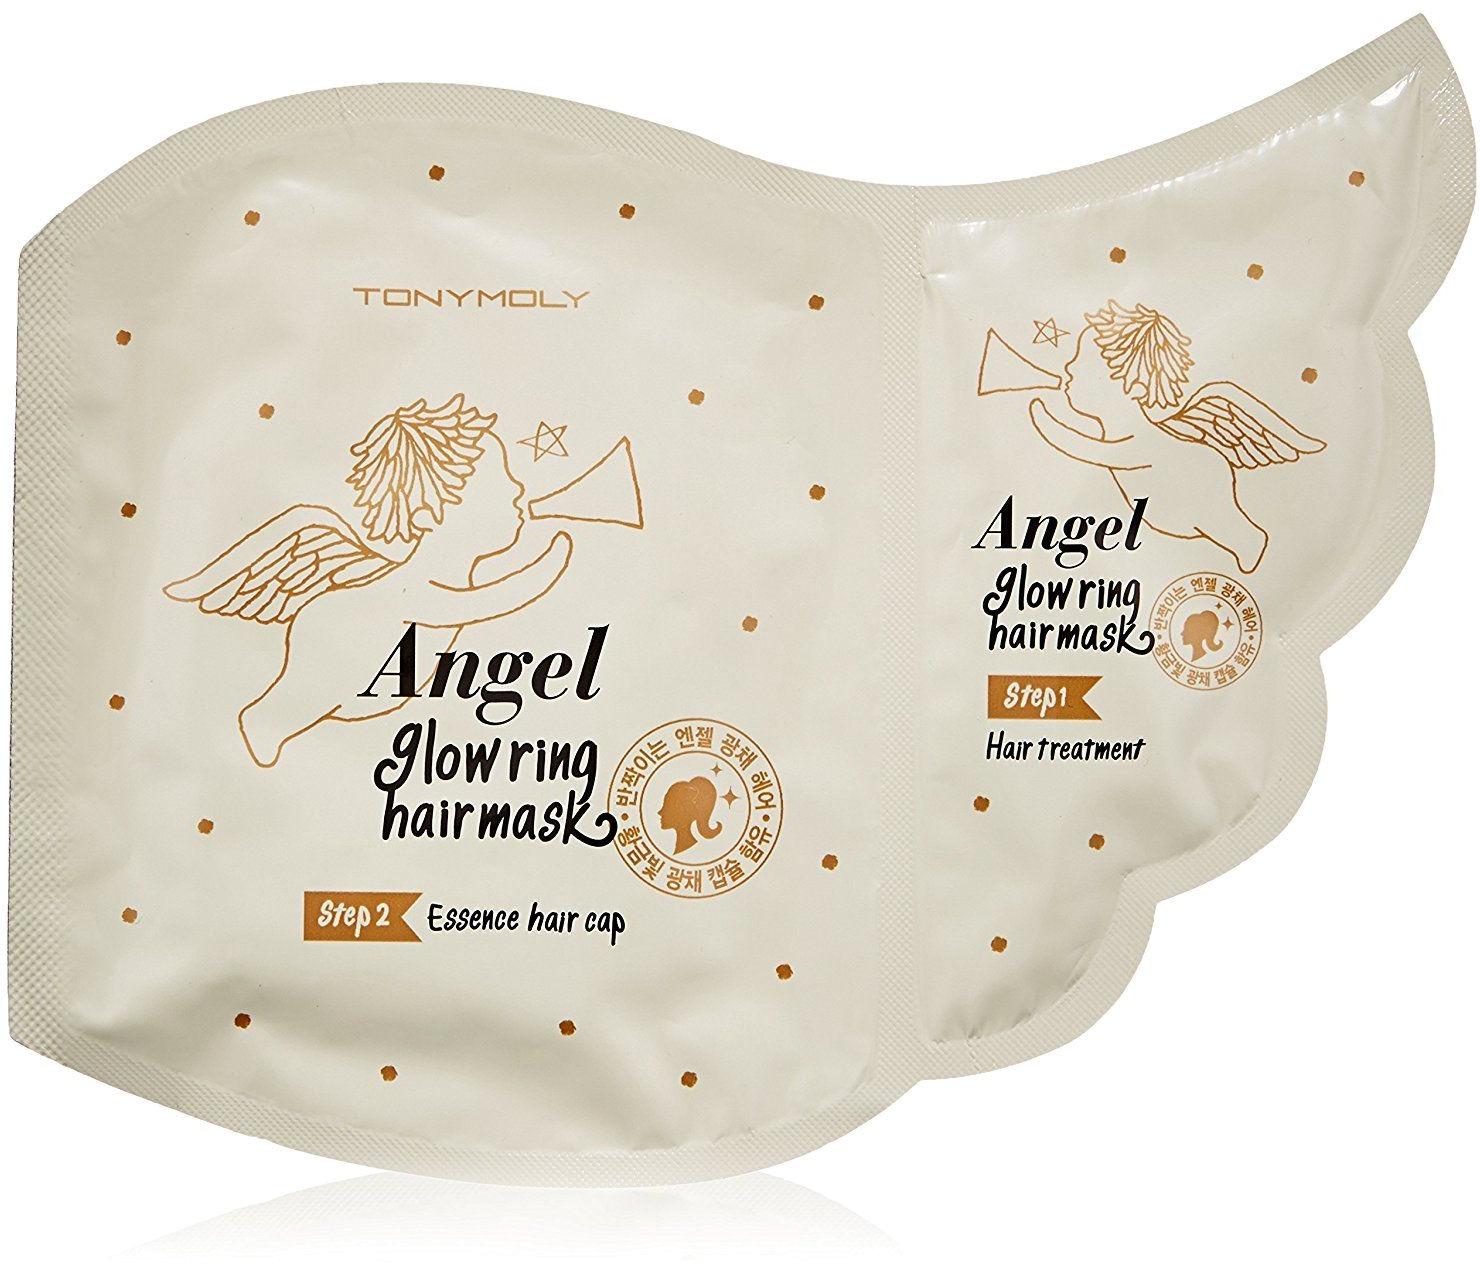 Купить Tony Moly Angel Glowring Hair Mask